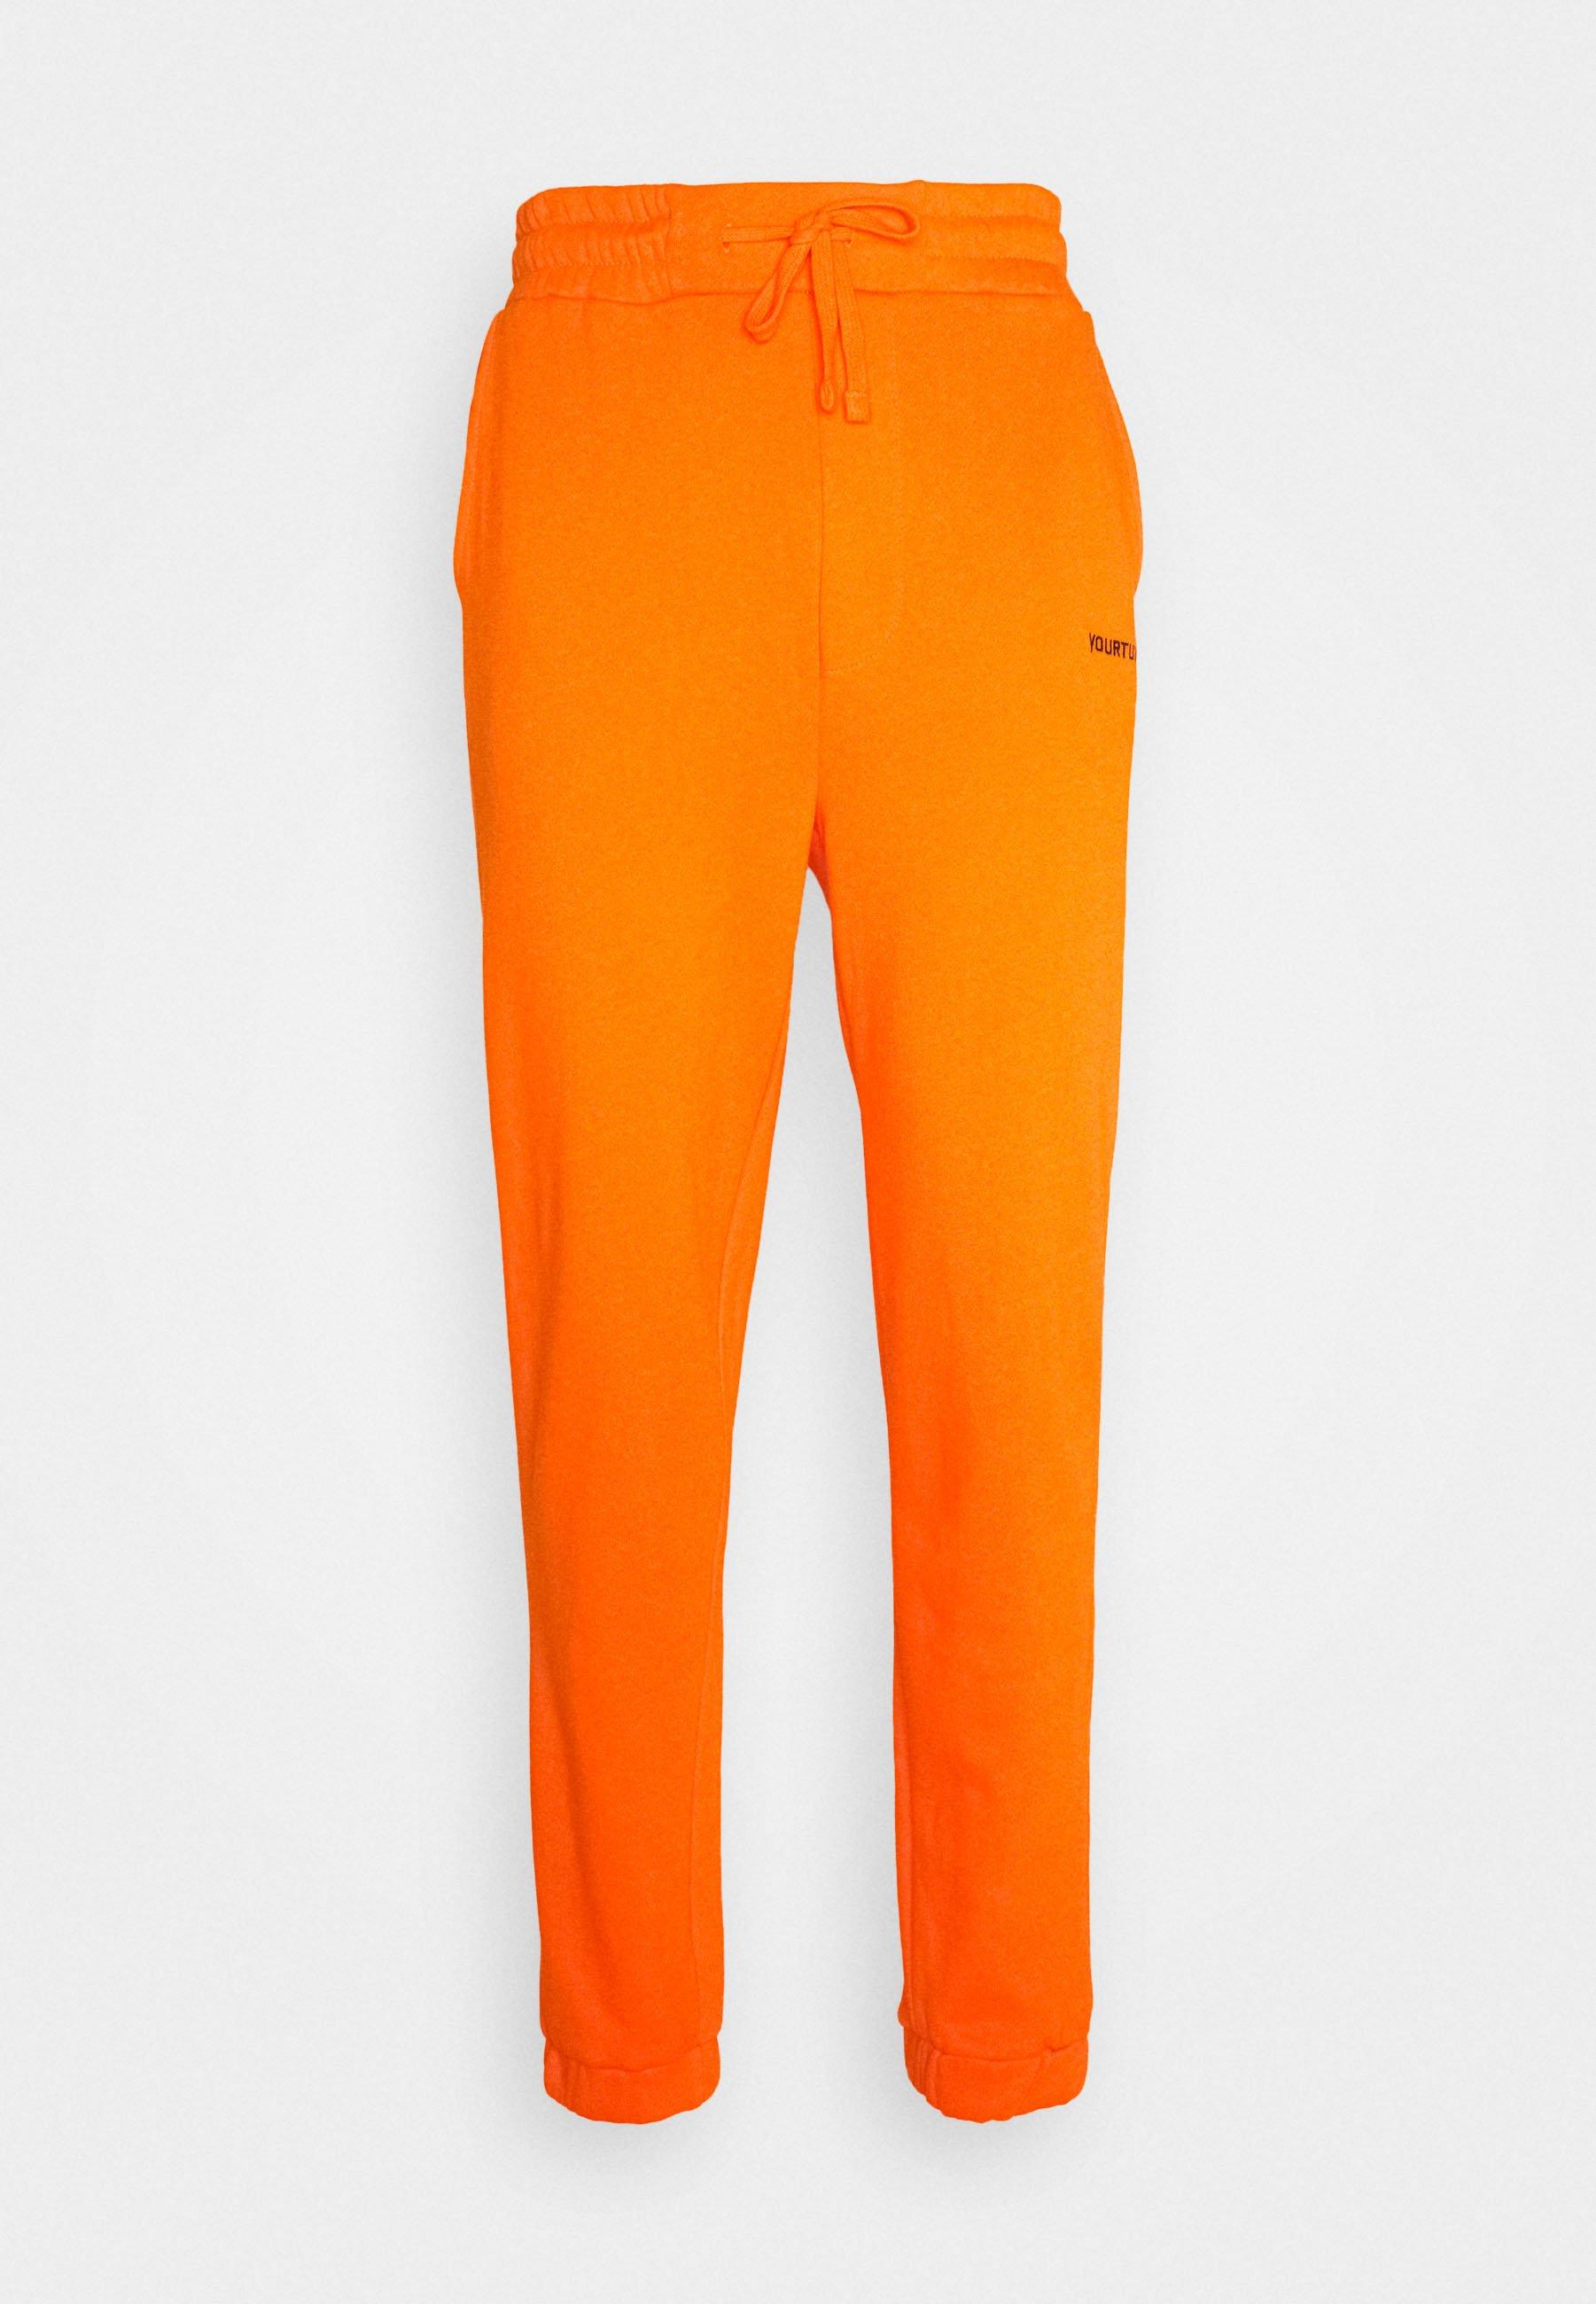 Herren Jogginghose - orange